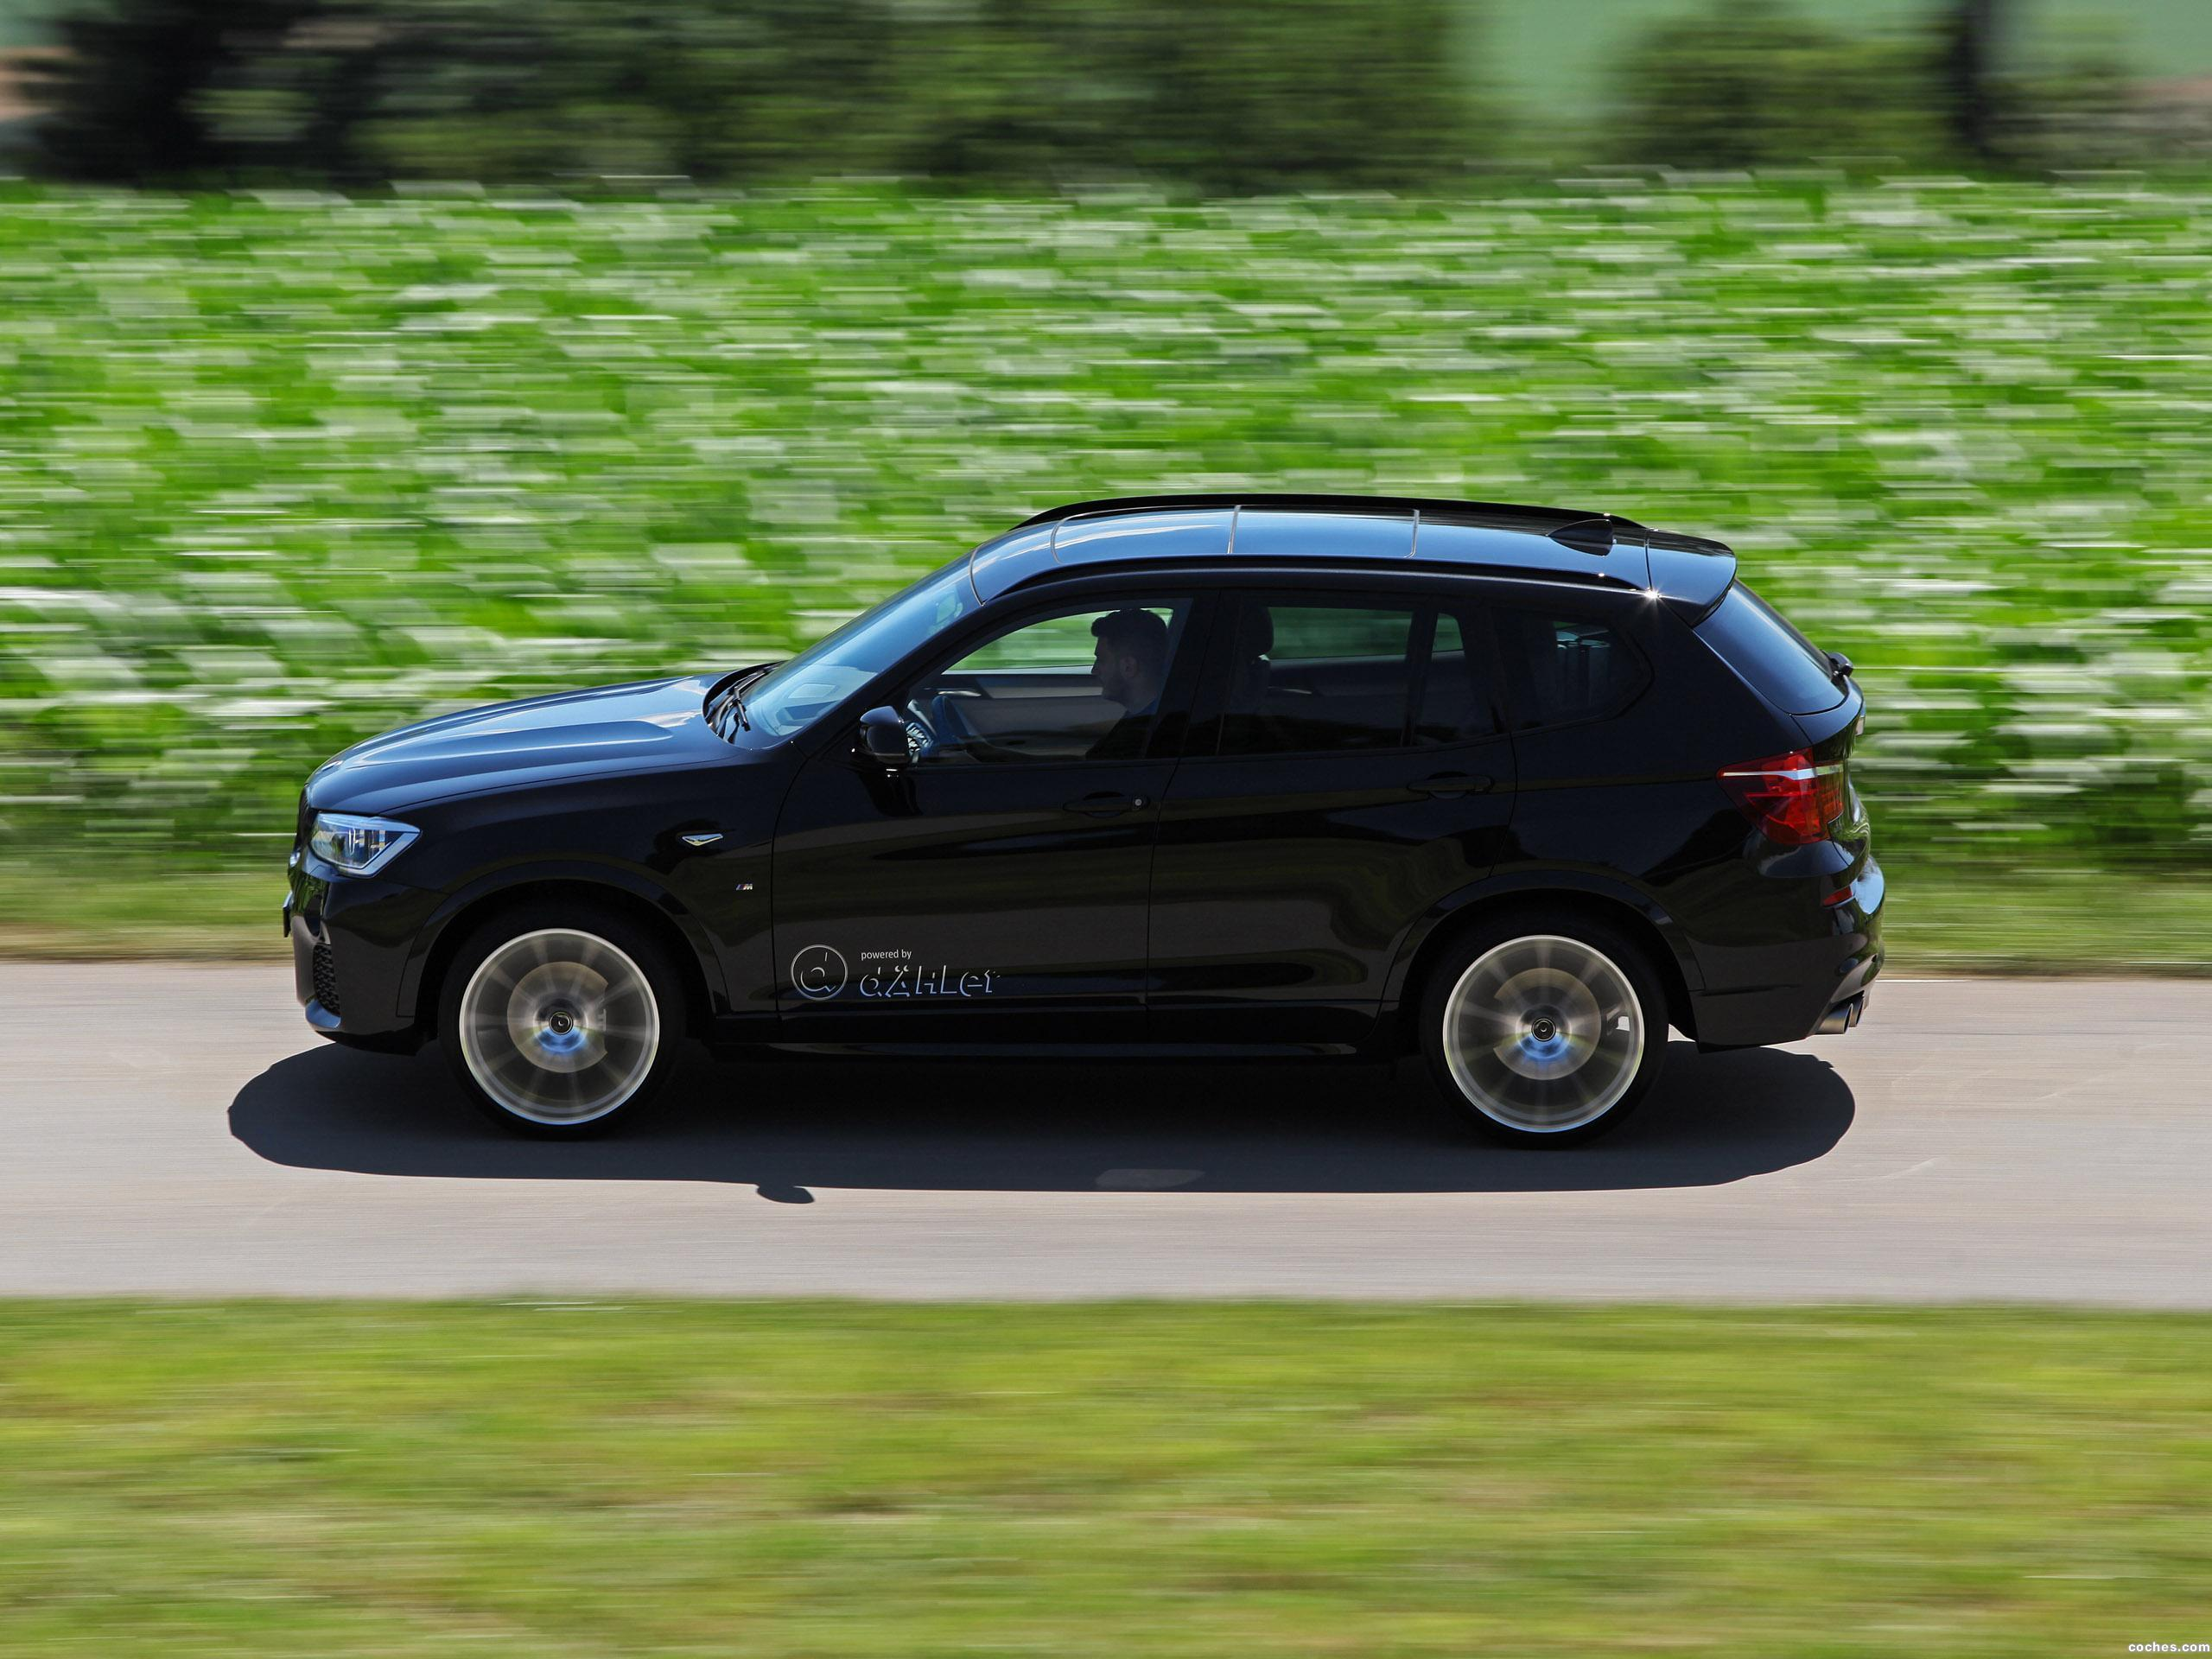 Foto 2 de Dahler BMW X1 F48 2018